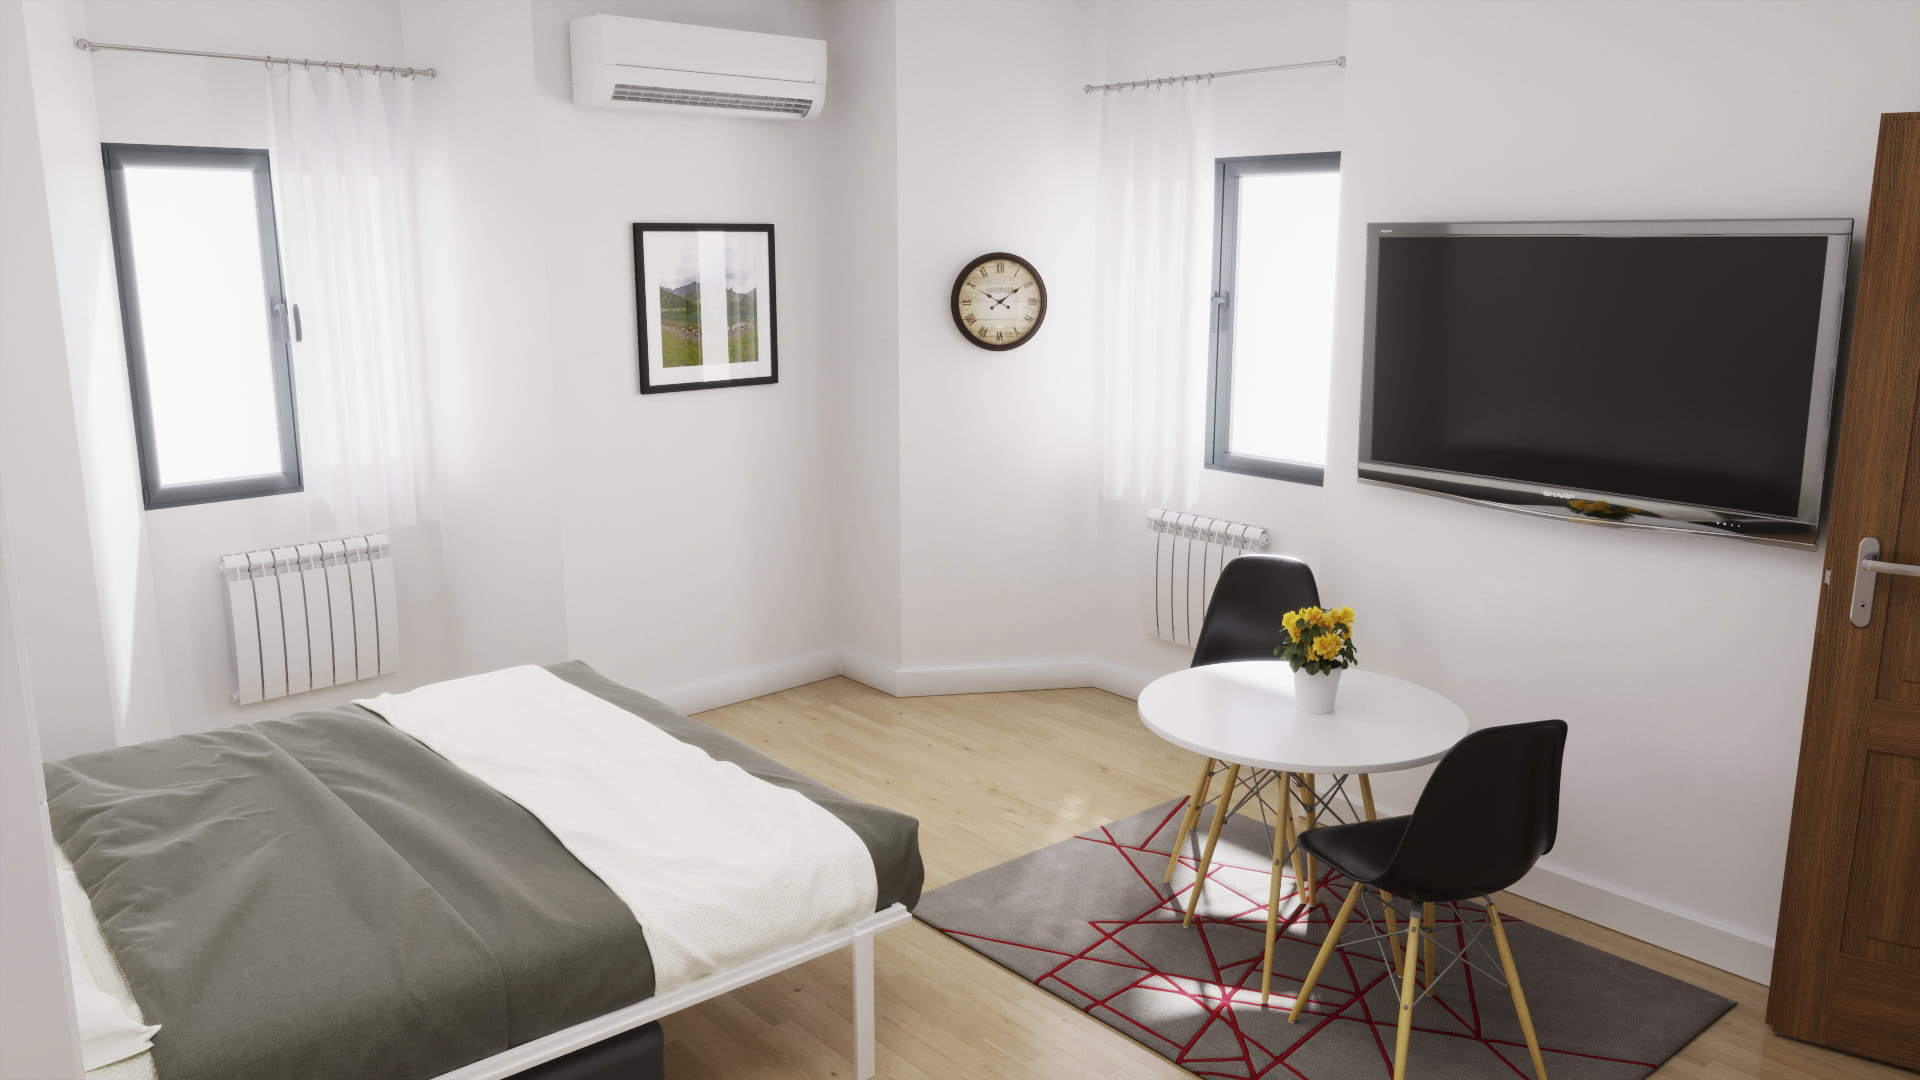 Appartamento 1 vista 2 DEF min